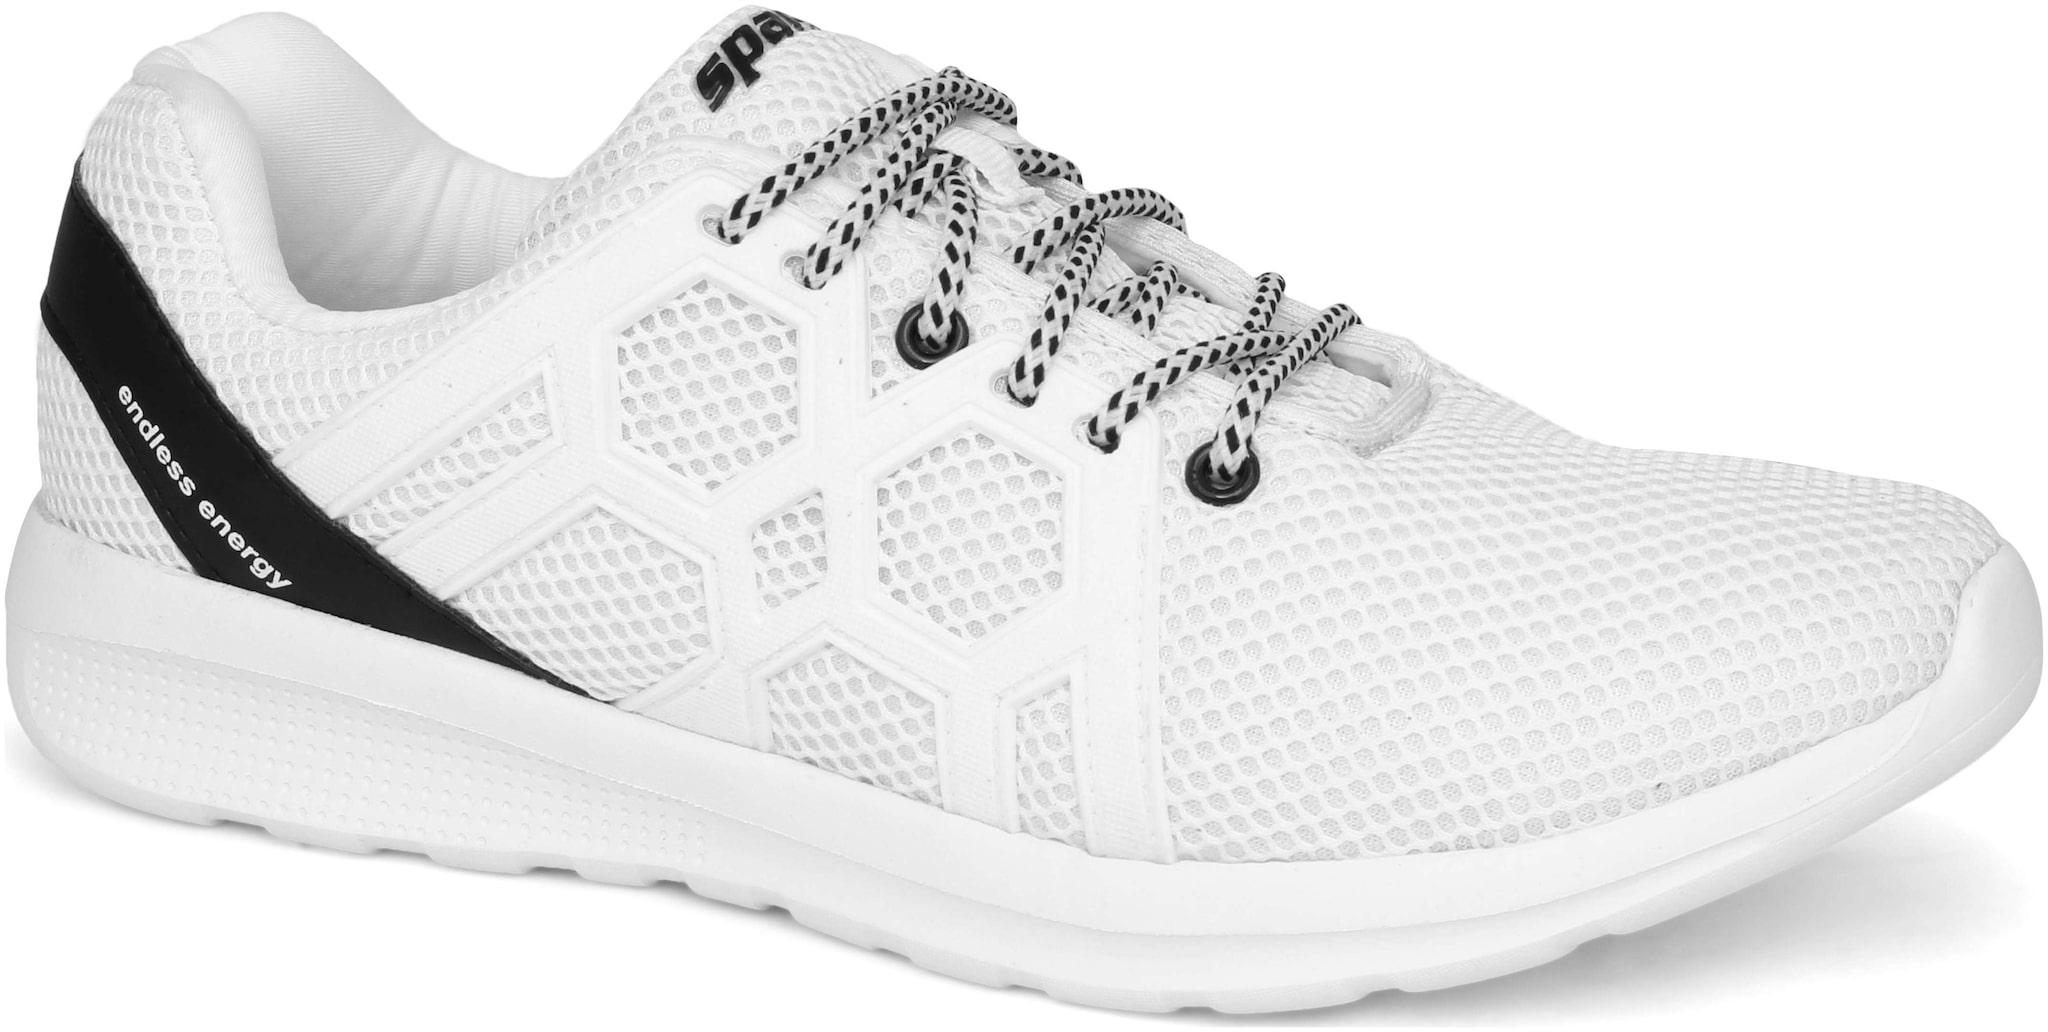 Sparx Men Running Shoes ( White ) for